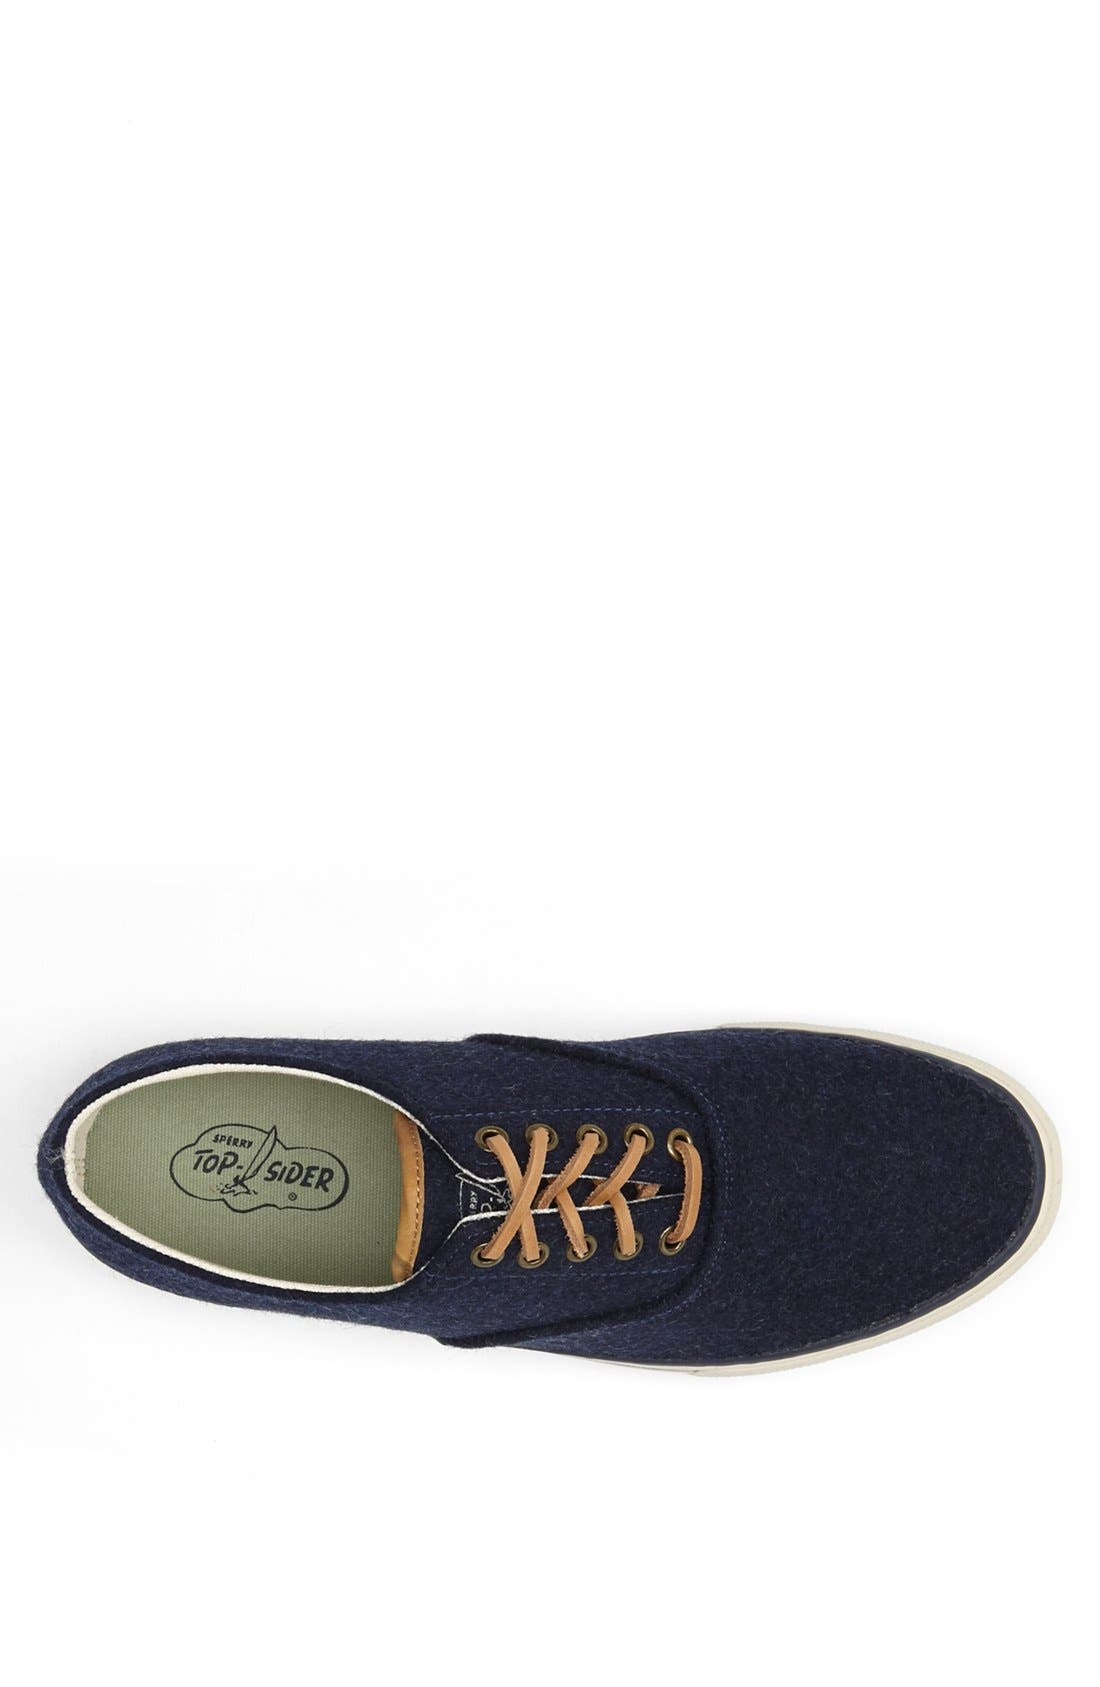 Alternate Image 3  - Sperry Top-Sider® 'American Originals - CVO' Sneaker